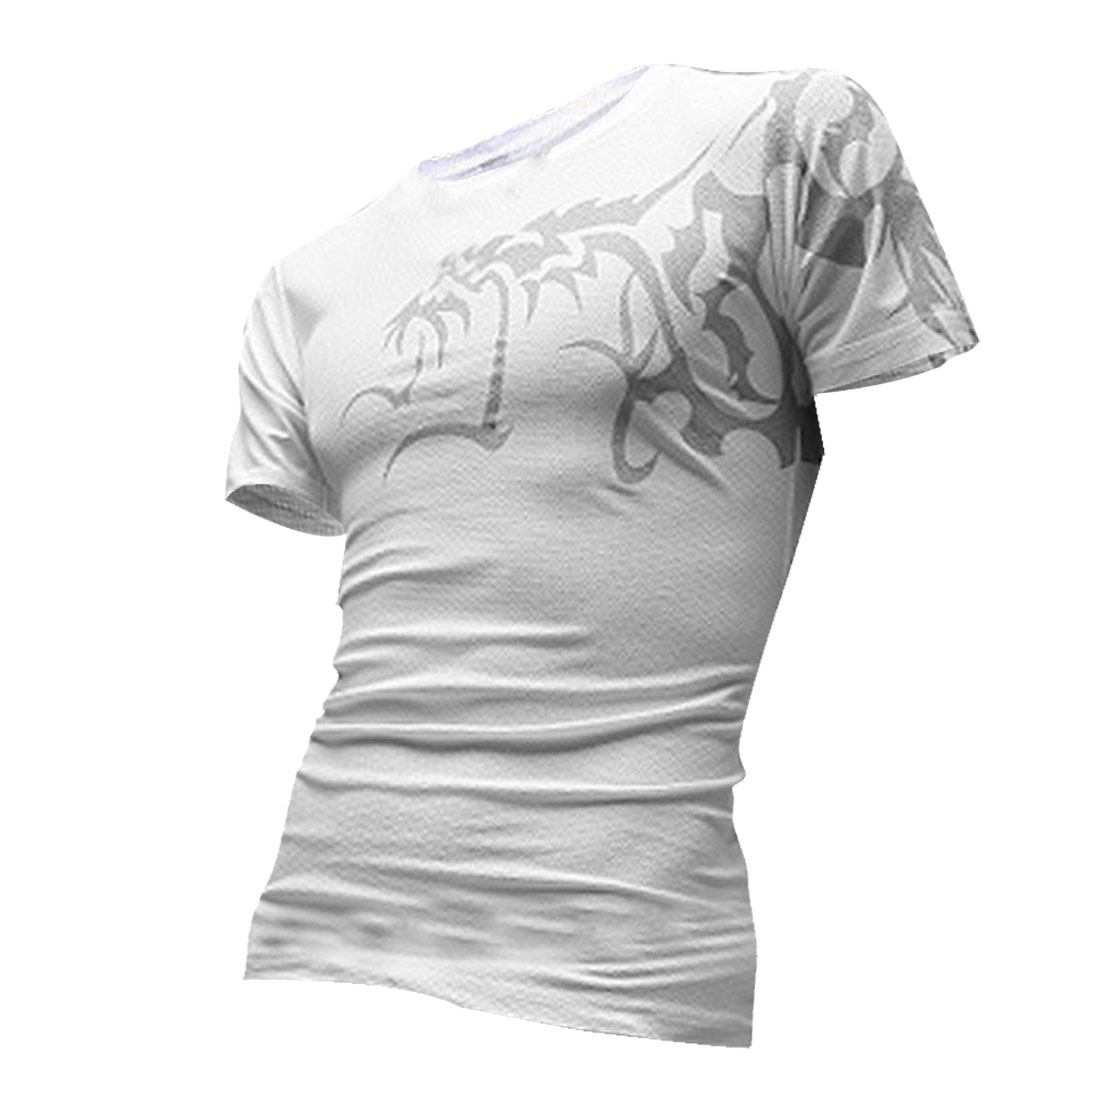 Q28 Men Round Neck Short Sleeve Tribal Pattern Design T-Shirt White XXL/M (US 38)